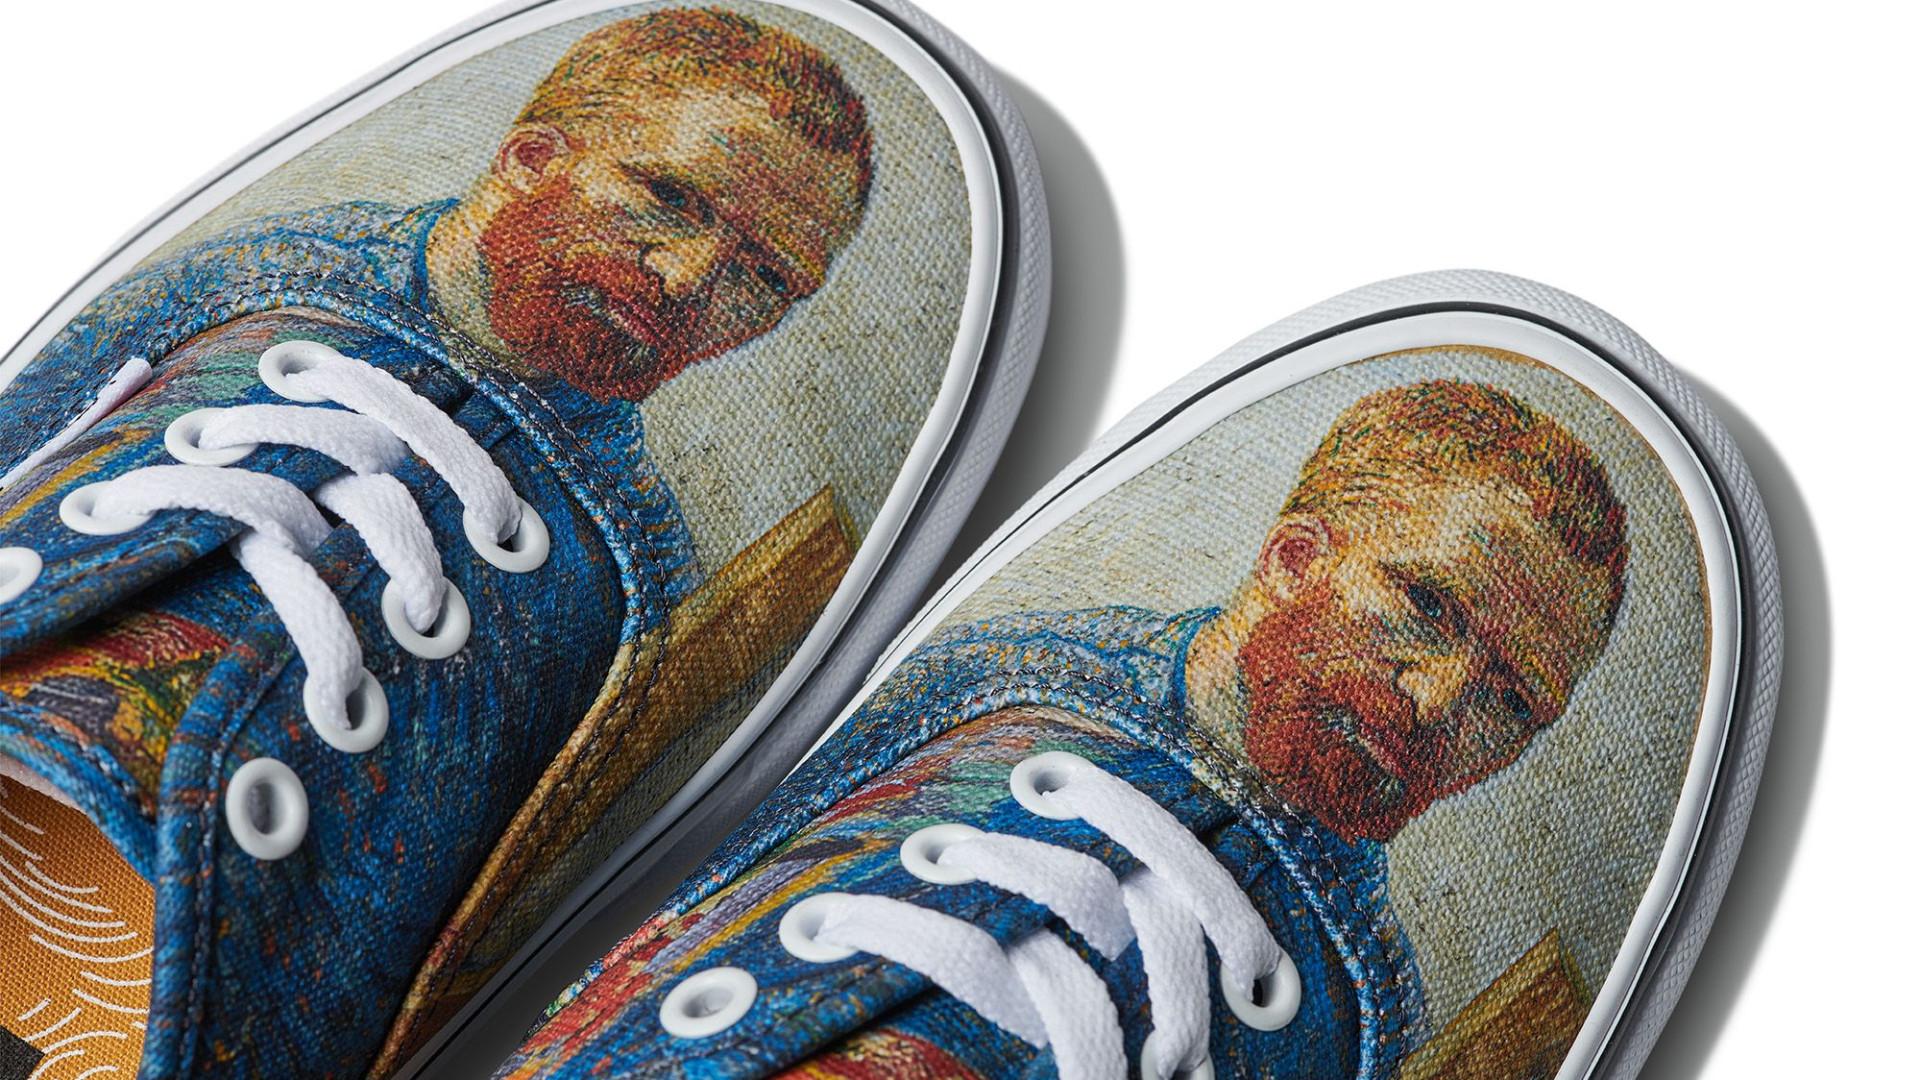 369bdc5dc9223 Vans junta-se ao Museu Van Gogh para colaboração exclusiva